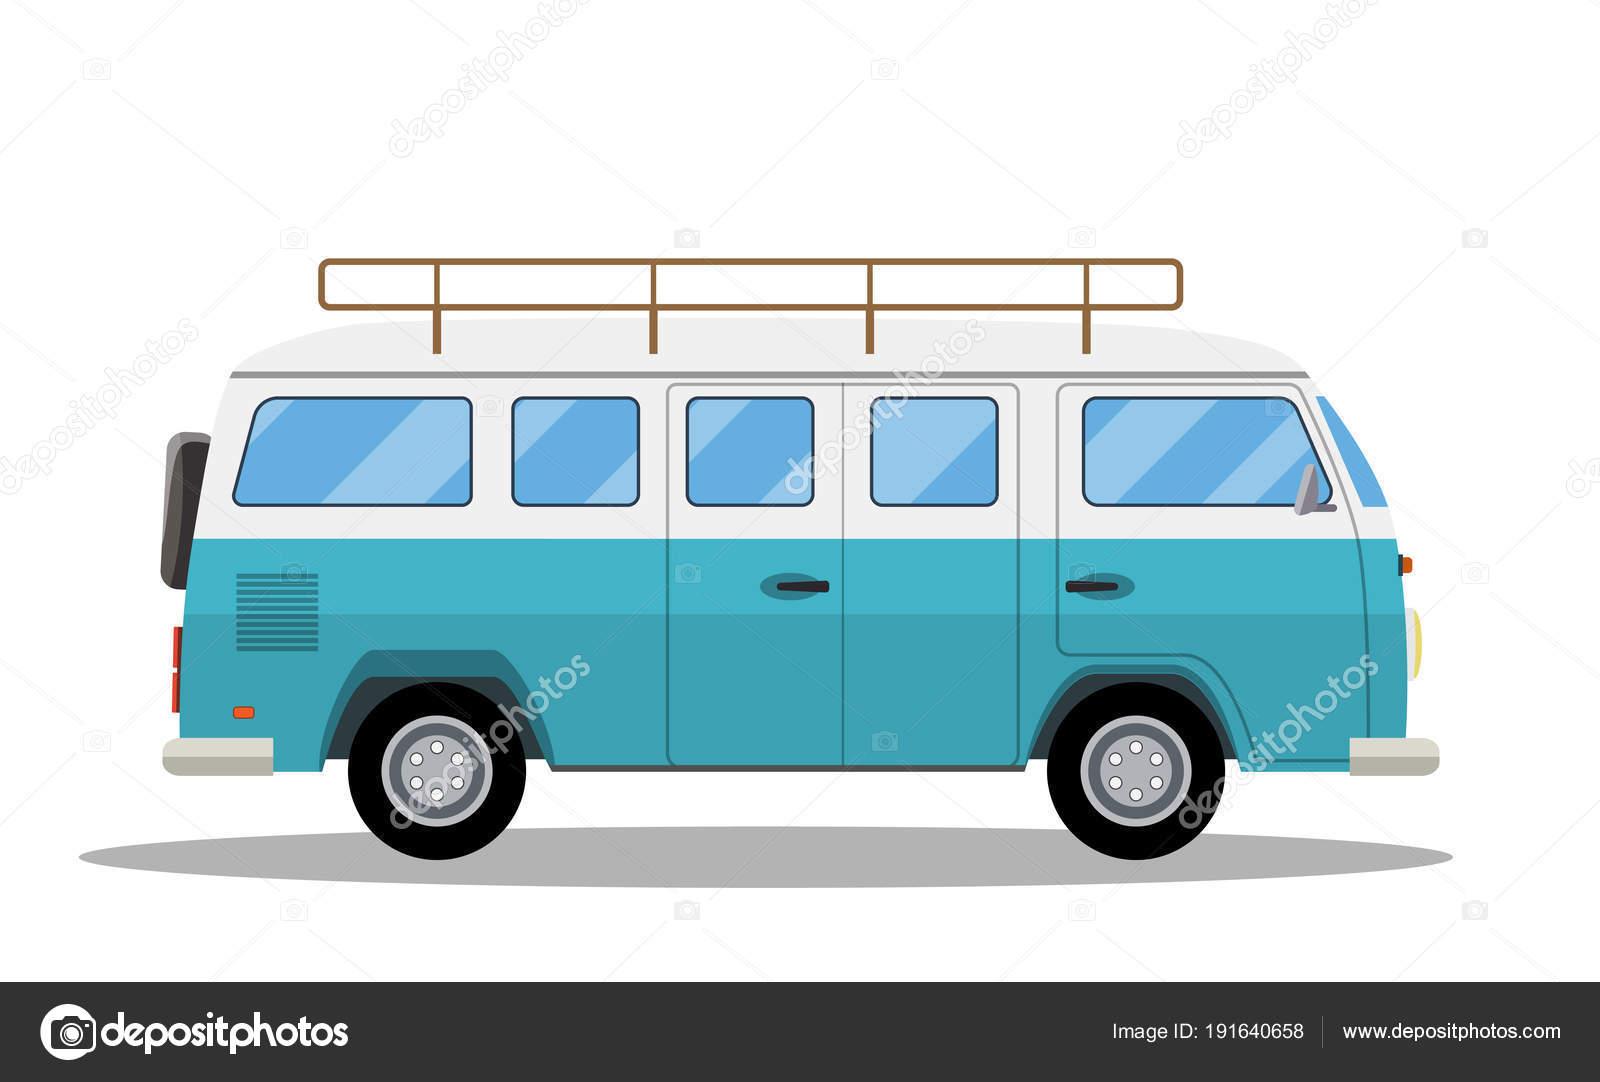 328b7c2227 Retro travel van icon. Surfer van. Vintage travel car. Old classic camper  minivan. Retro hippie bus.Vector illustration in flat style isolated on  white ...